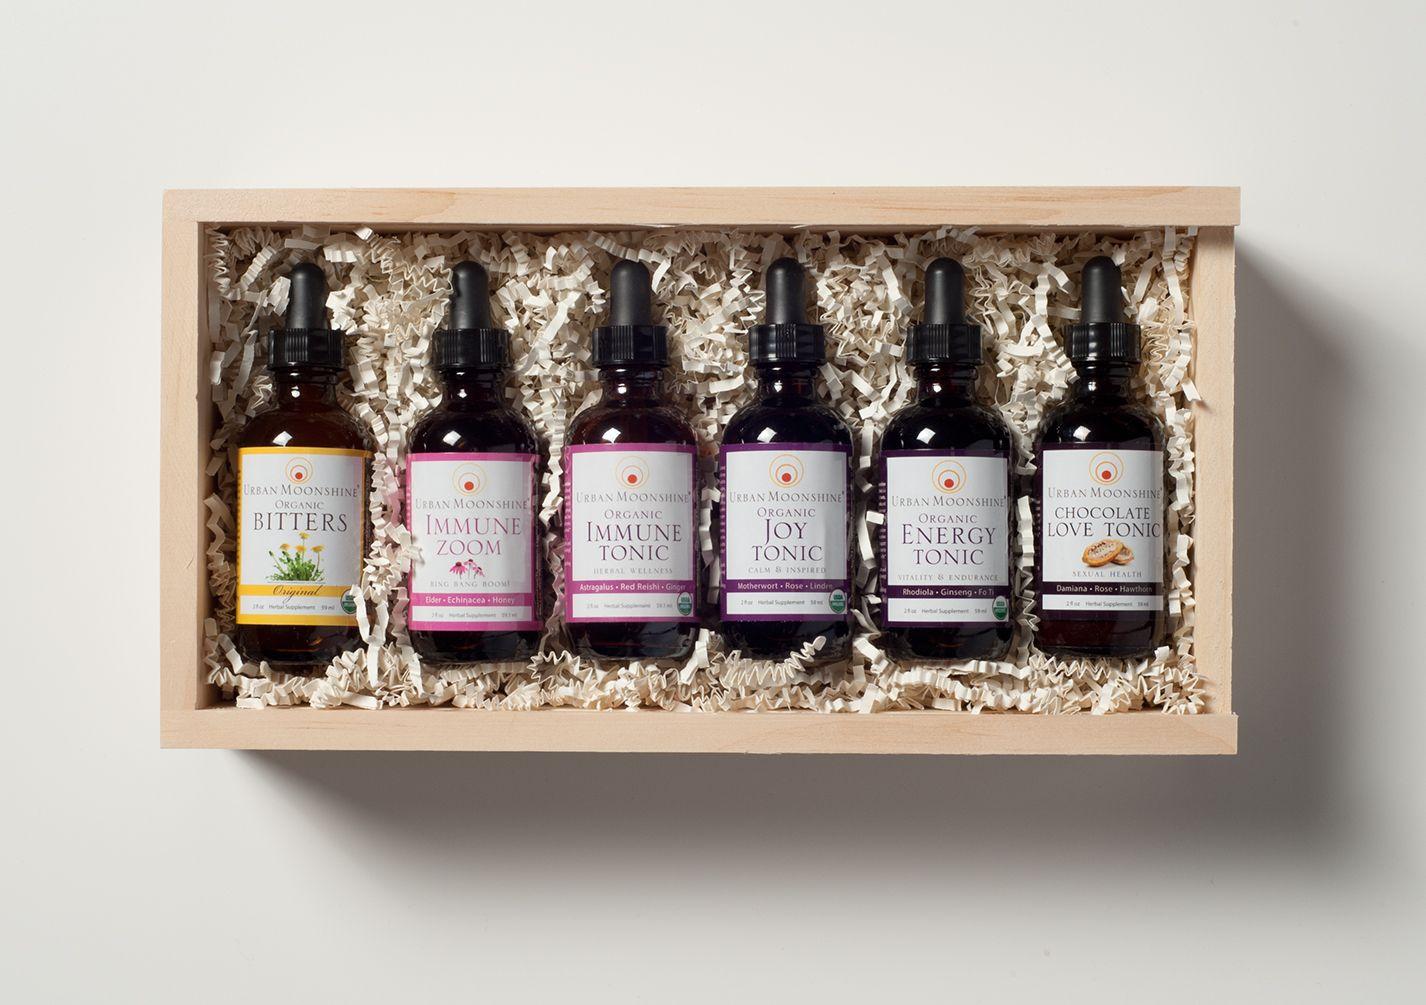 Everyday apothecary wooden box set urban moonshine